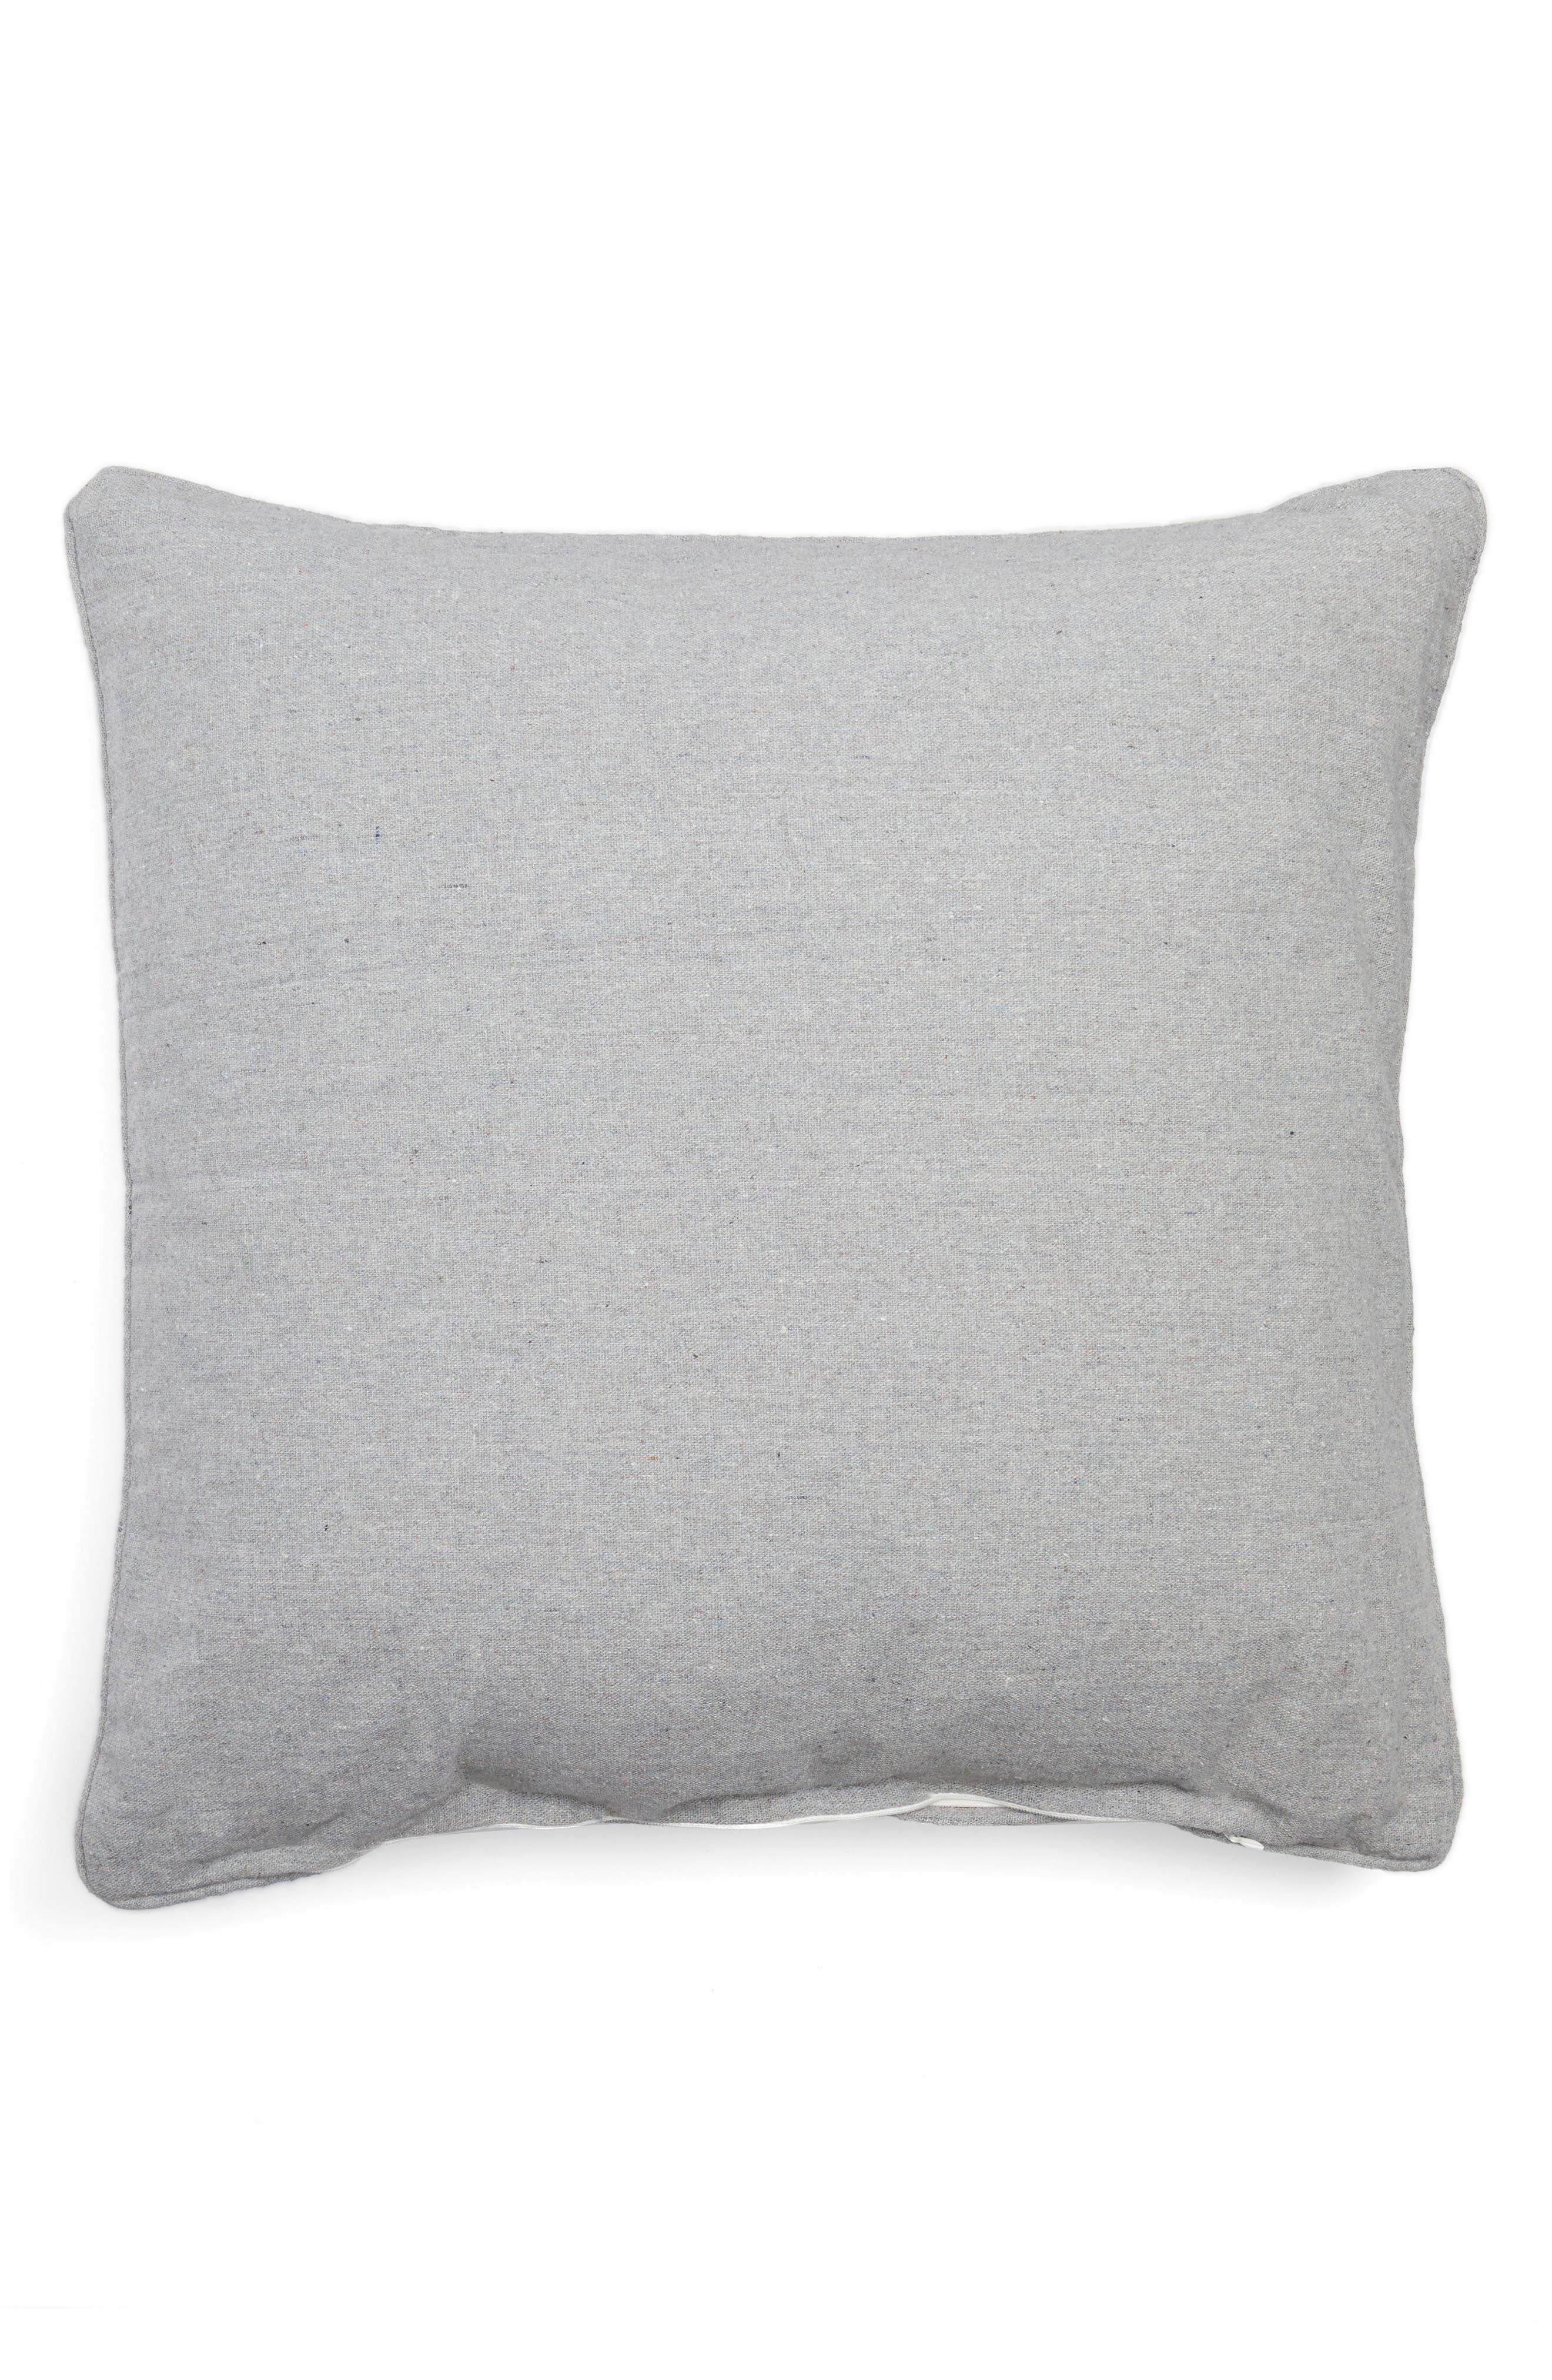 Nala Towel Stitch Accent Pillow,                             Alternate thumbnail 2, color,